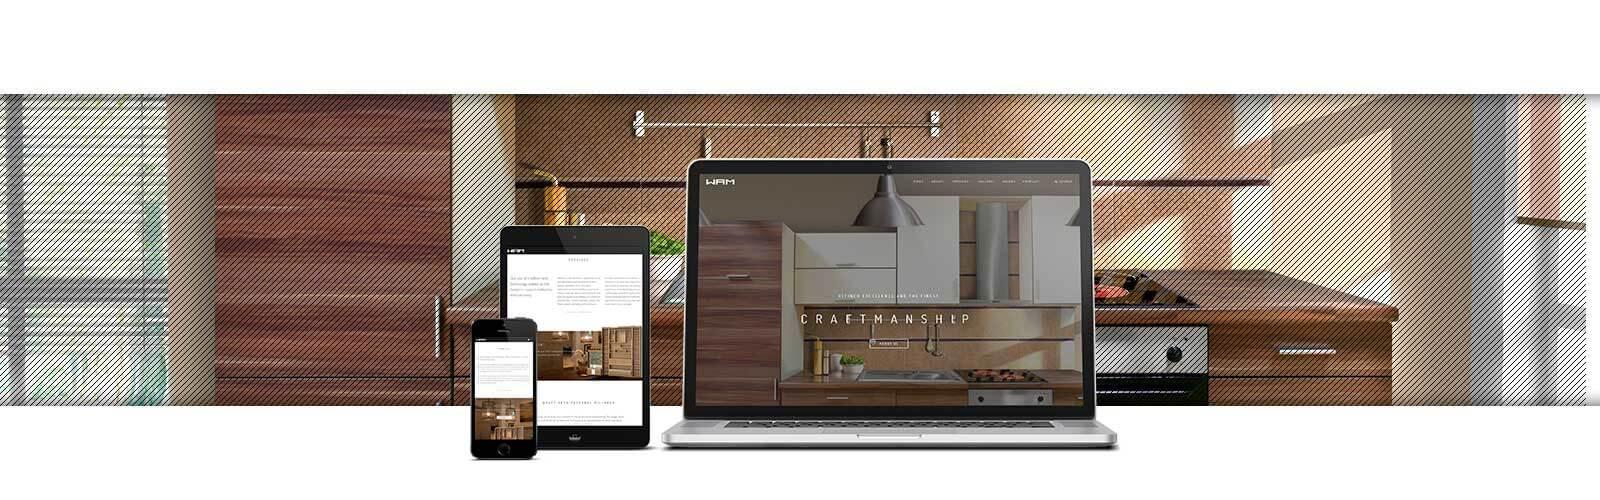 portfolio-detail-device